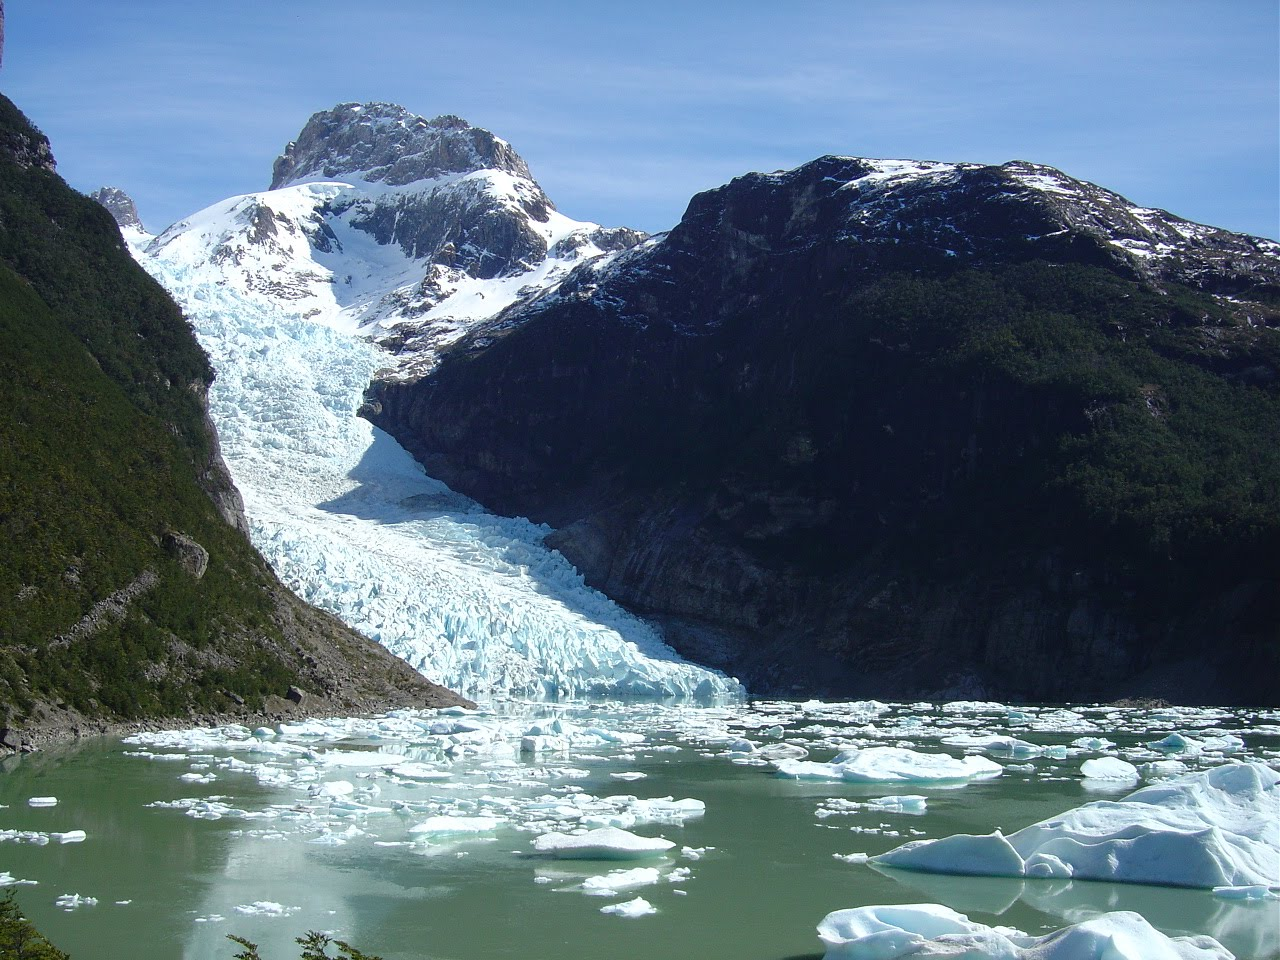 Mi Viaje a Chile (05-10-2005)